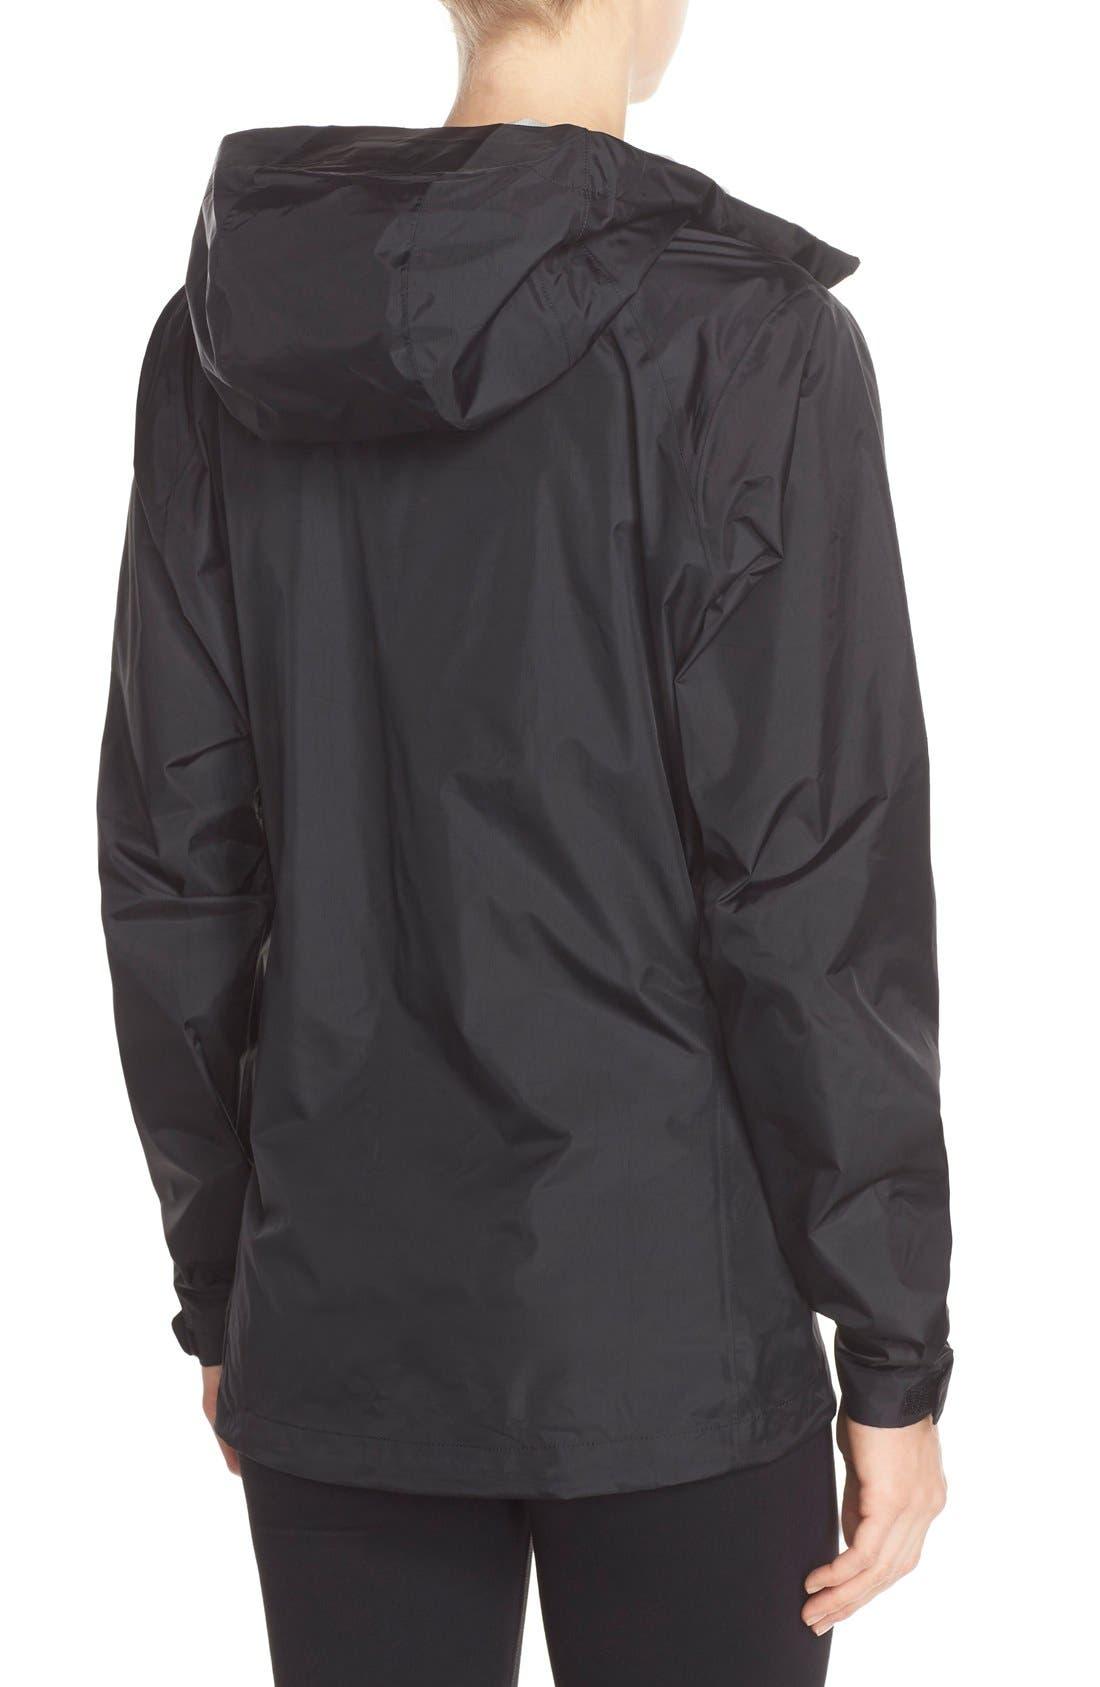 PATAGONIA, Torrentshell Jacket, Alternate thumbnail 4, color, BLACK